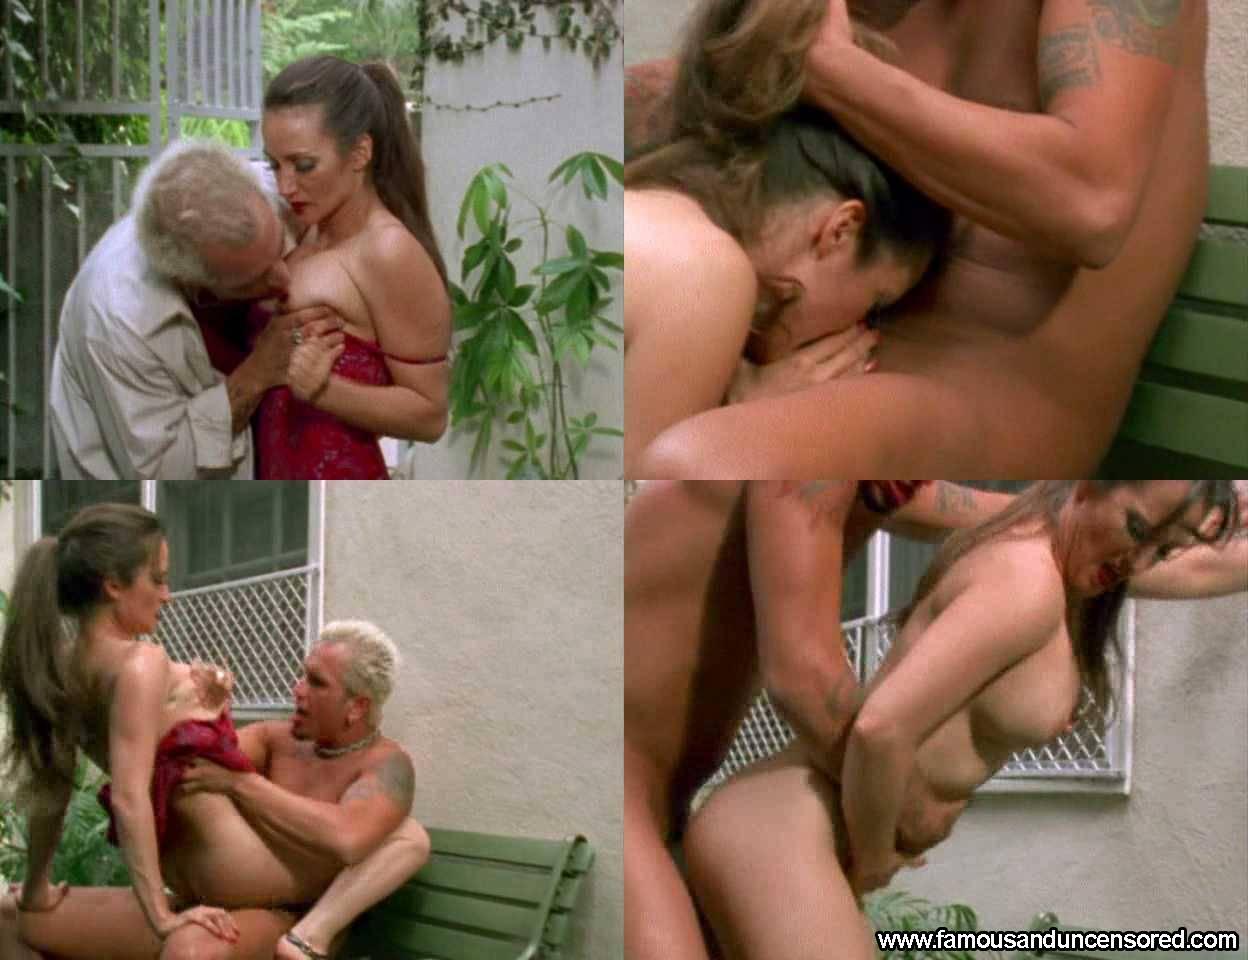 ambition Jacklyn lick naked